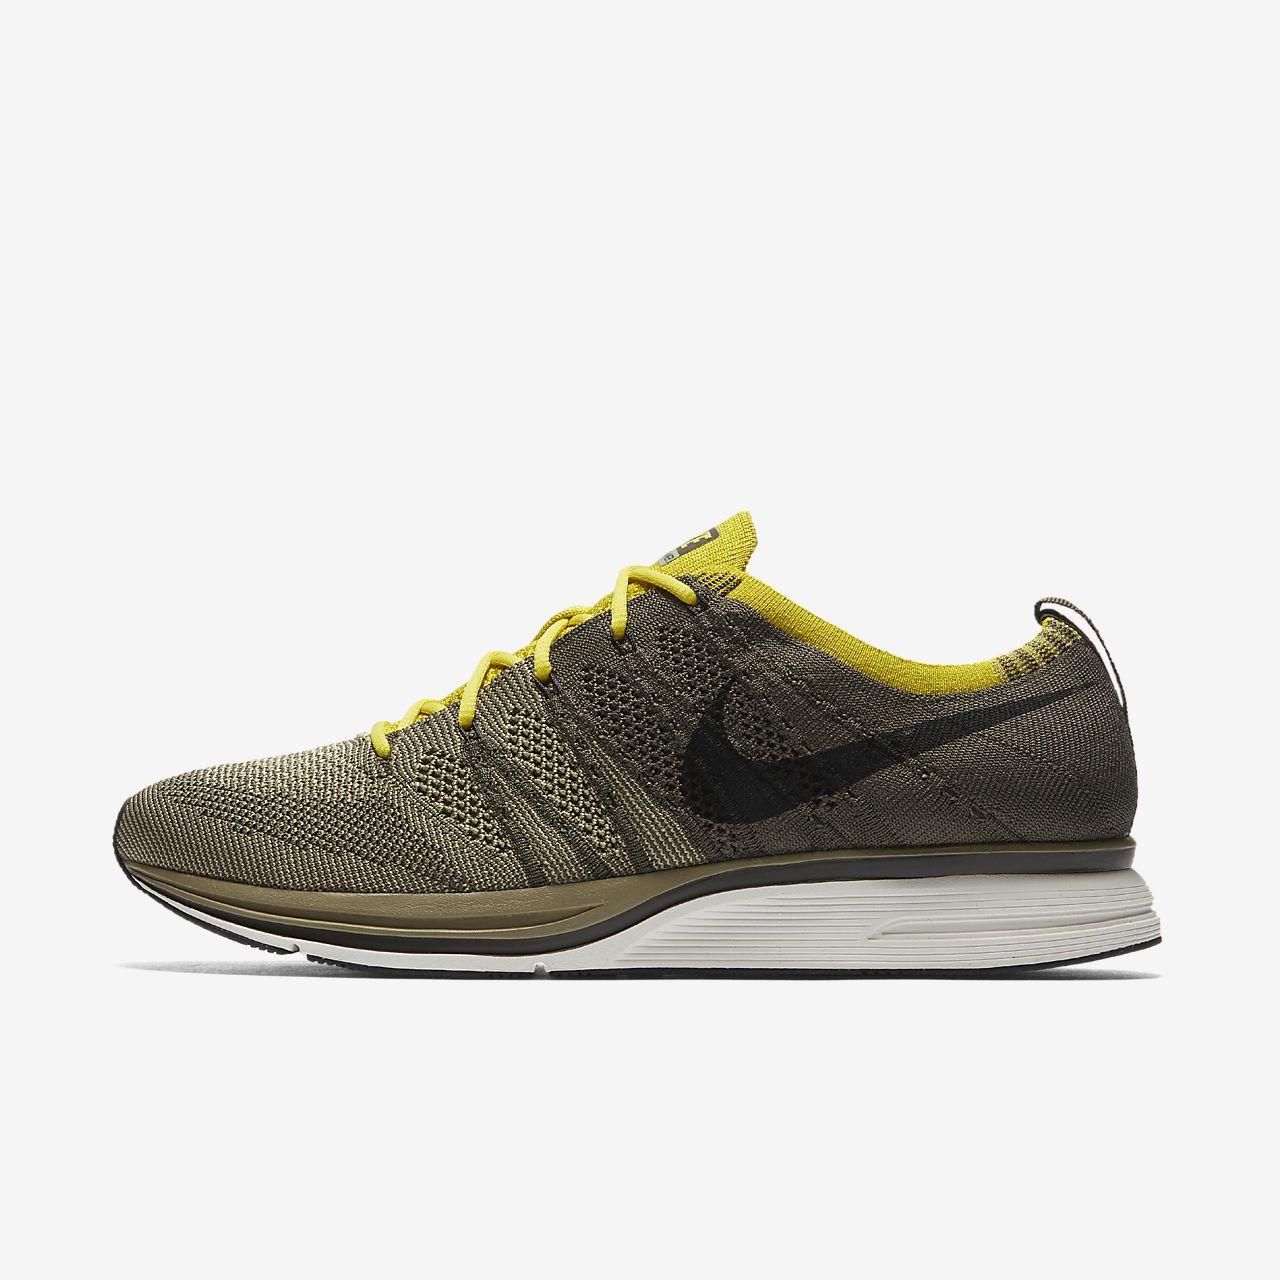 Unisex παπούτσι Nike Flyknit Trainer